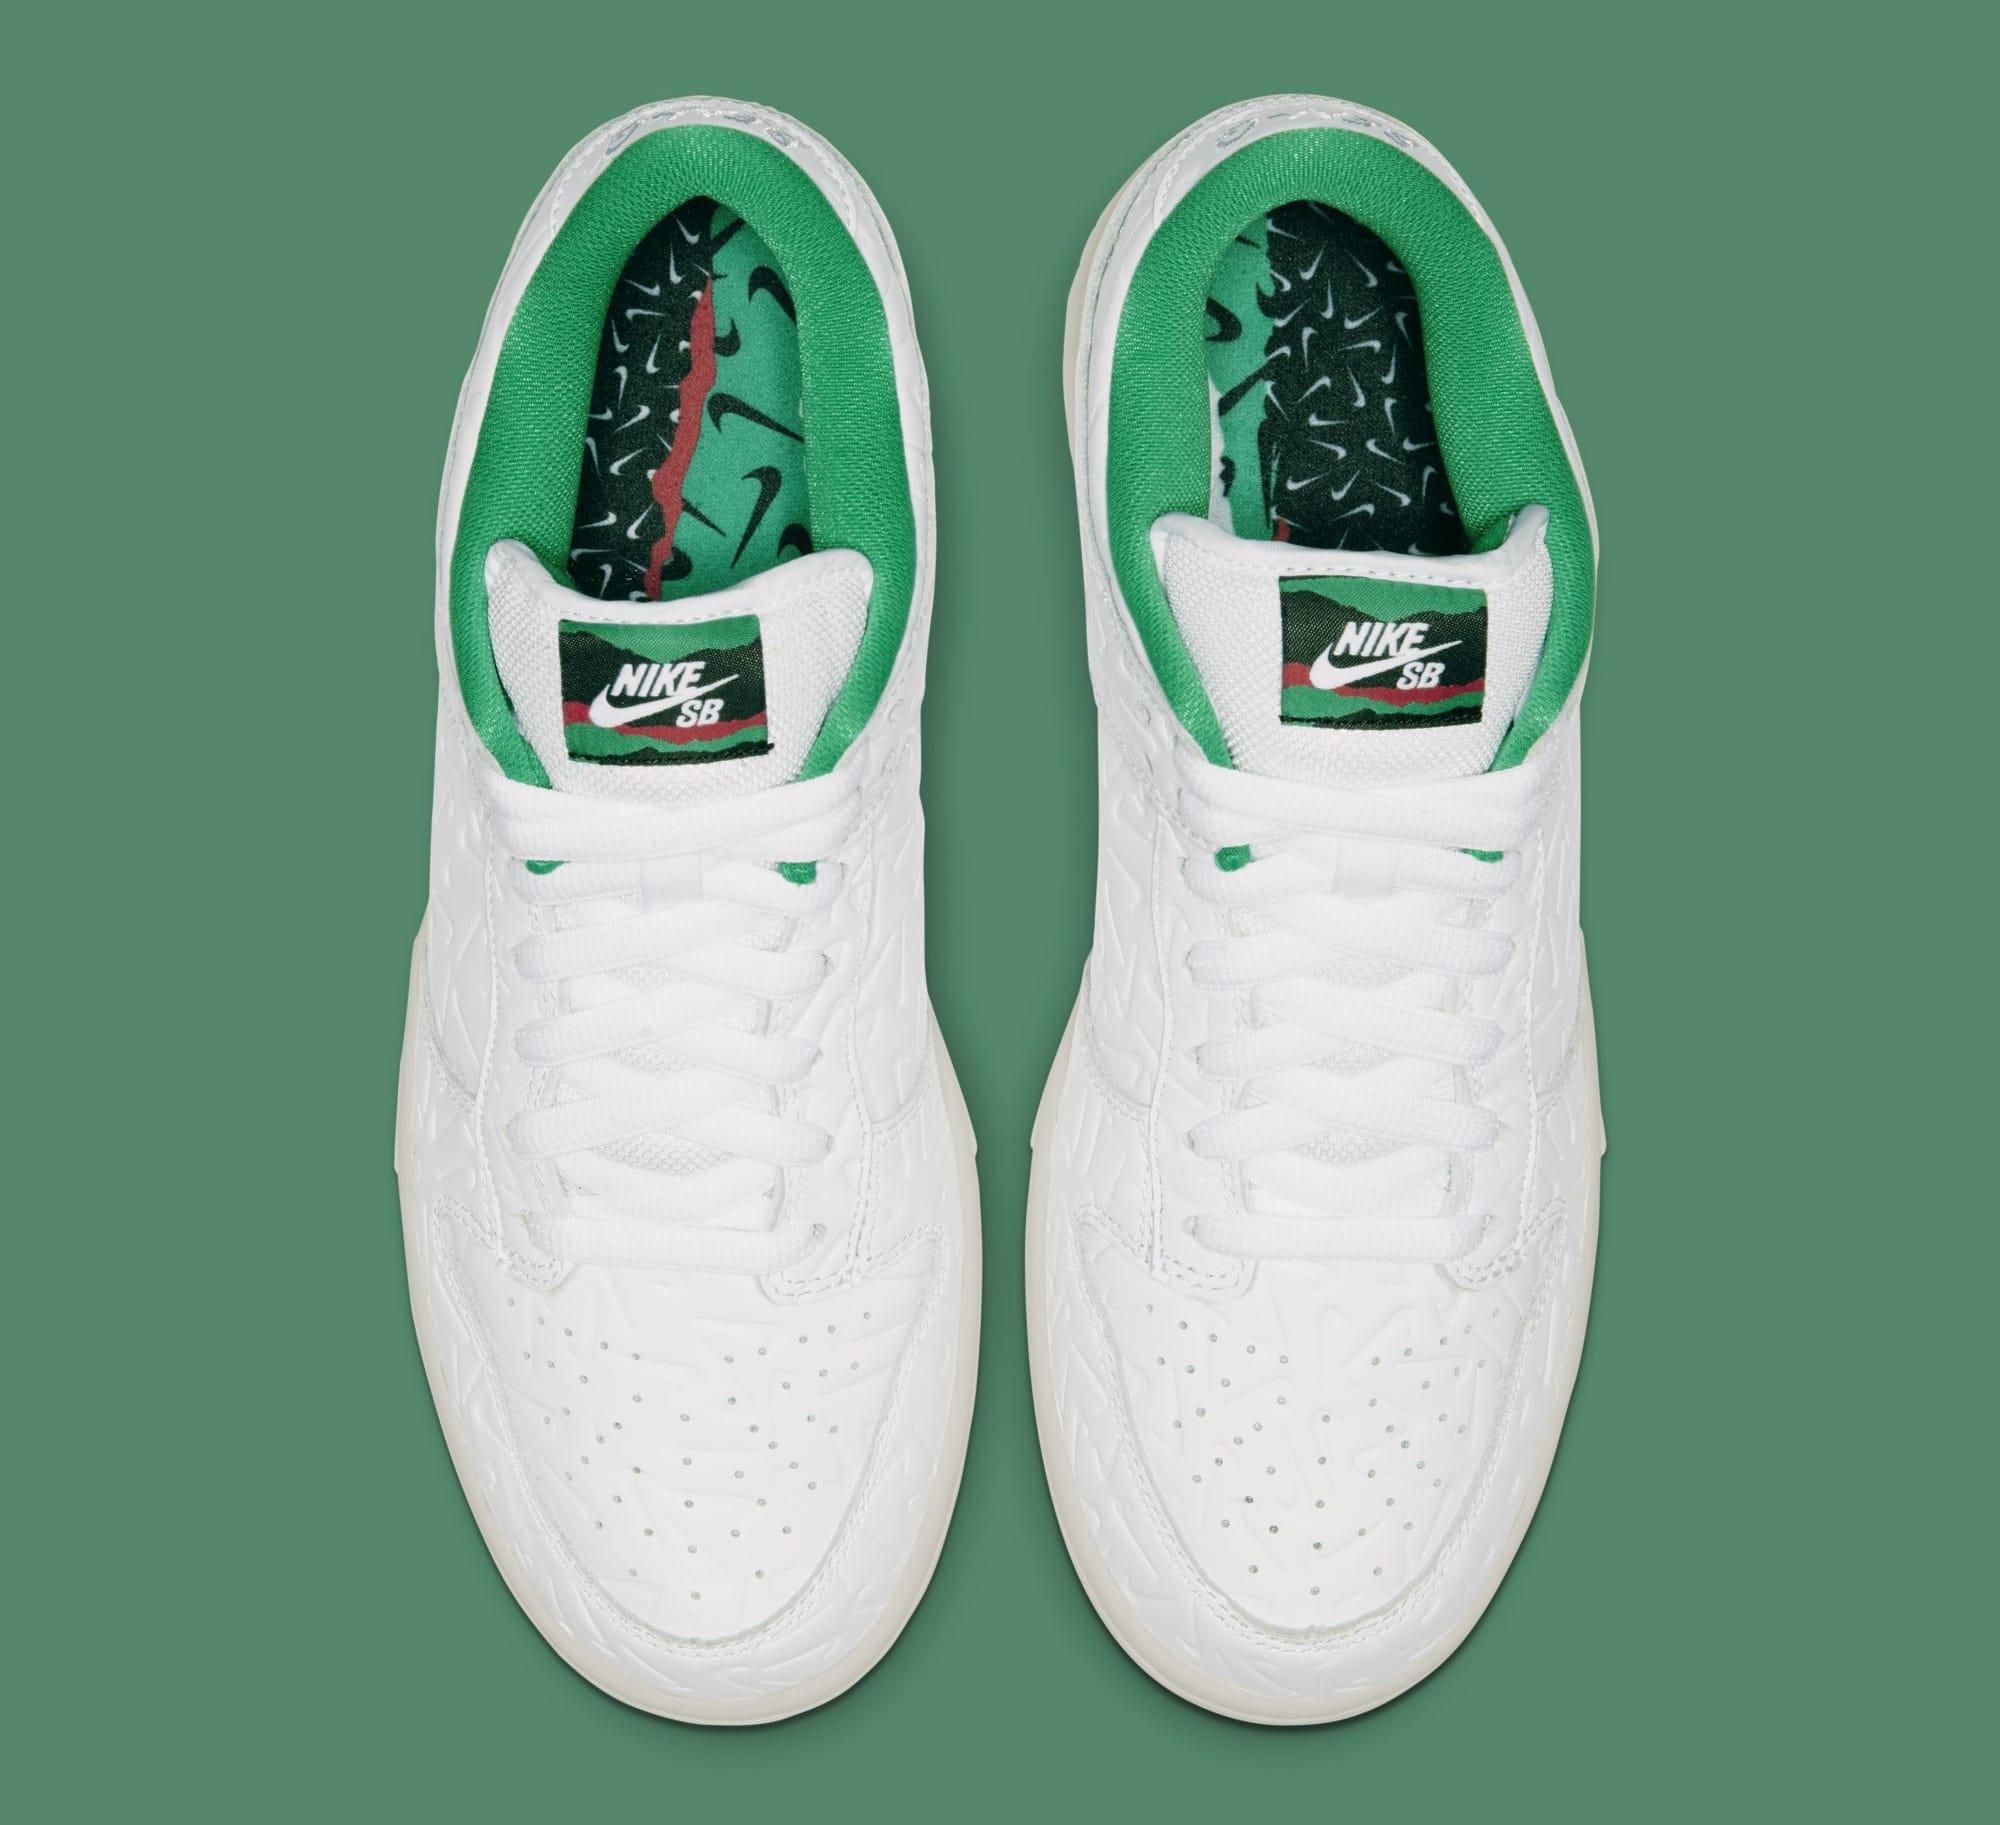 Ben-G x Nike SB Dunk Low CU3846-100 (Top)